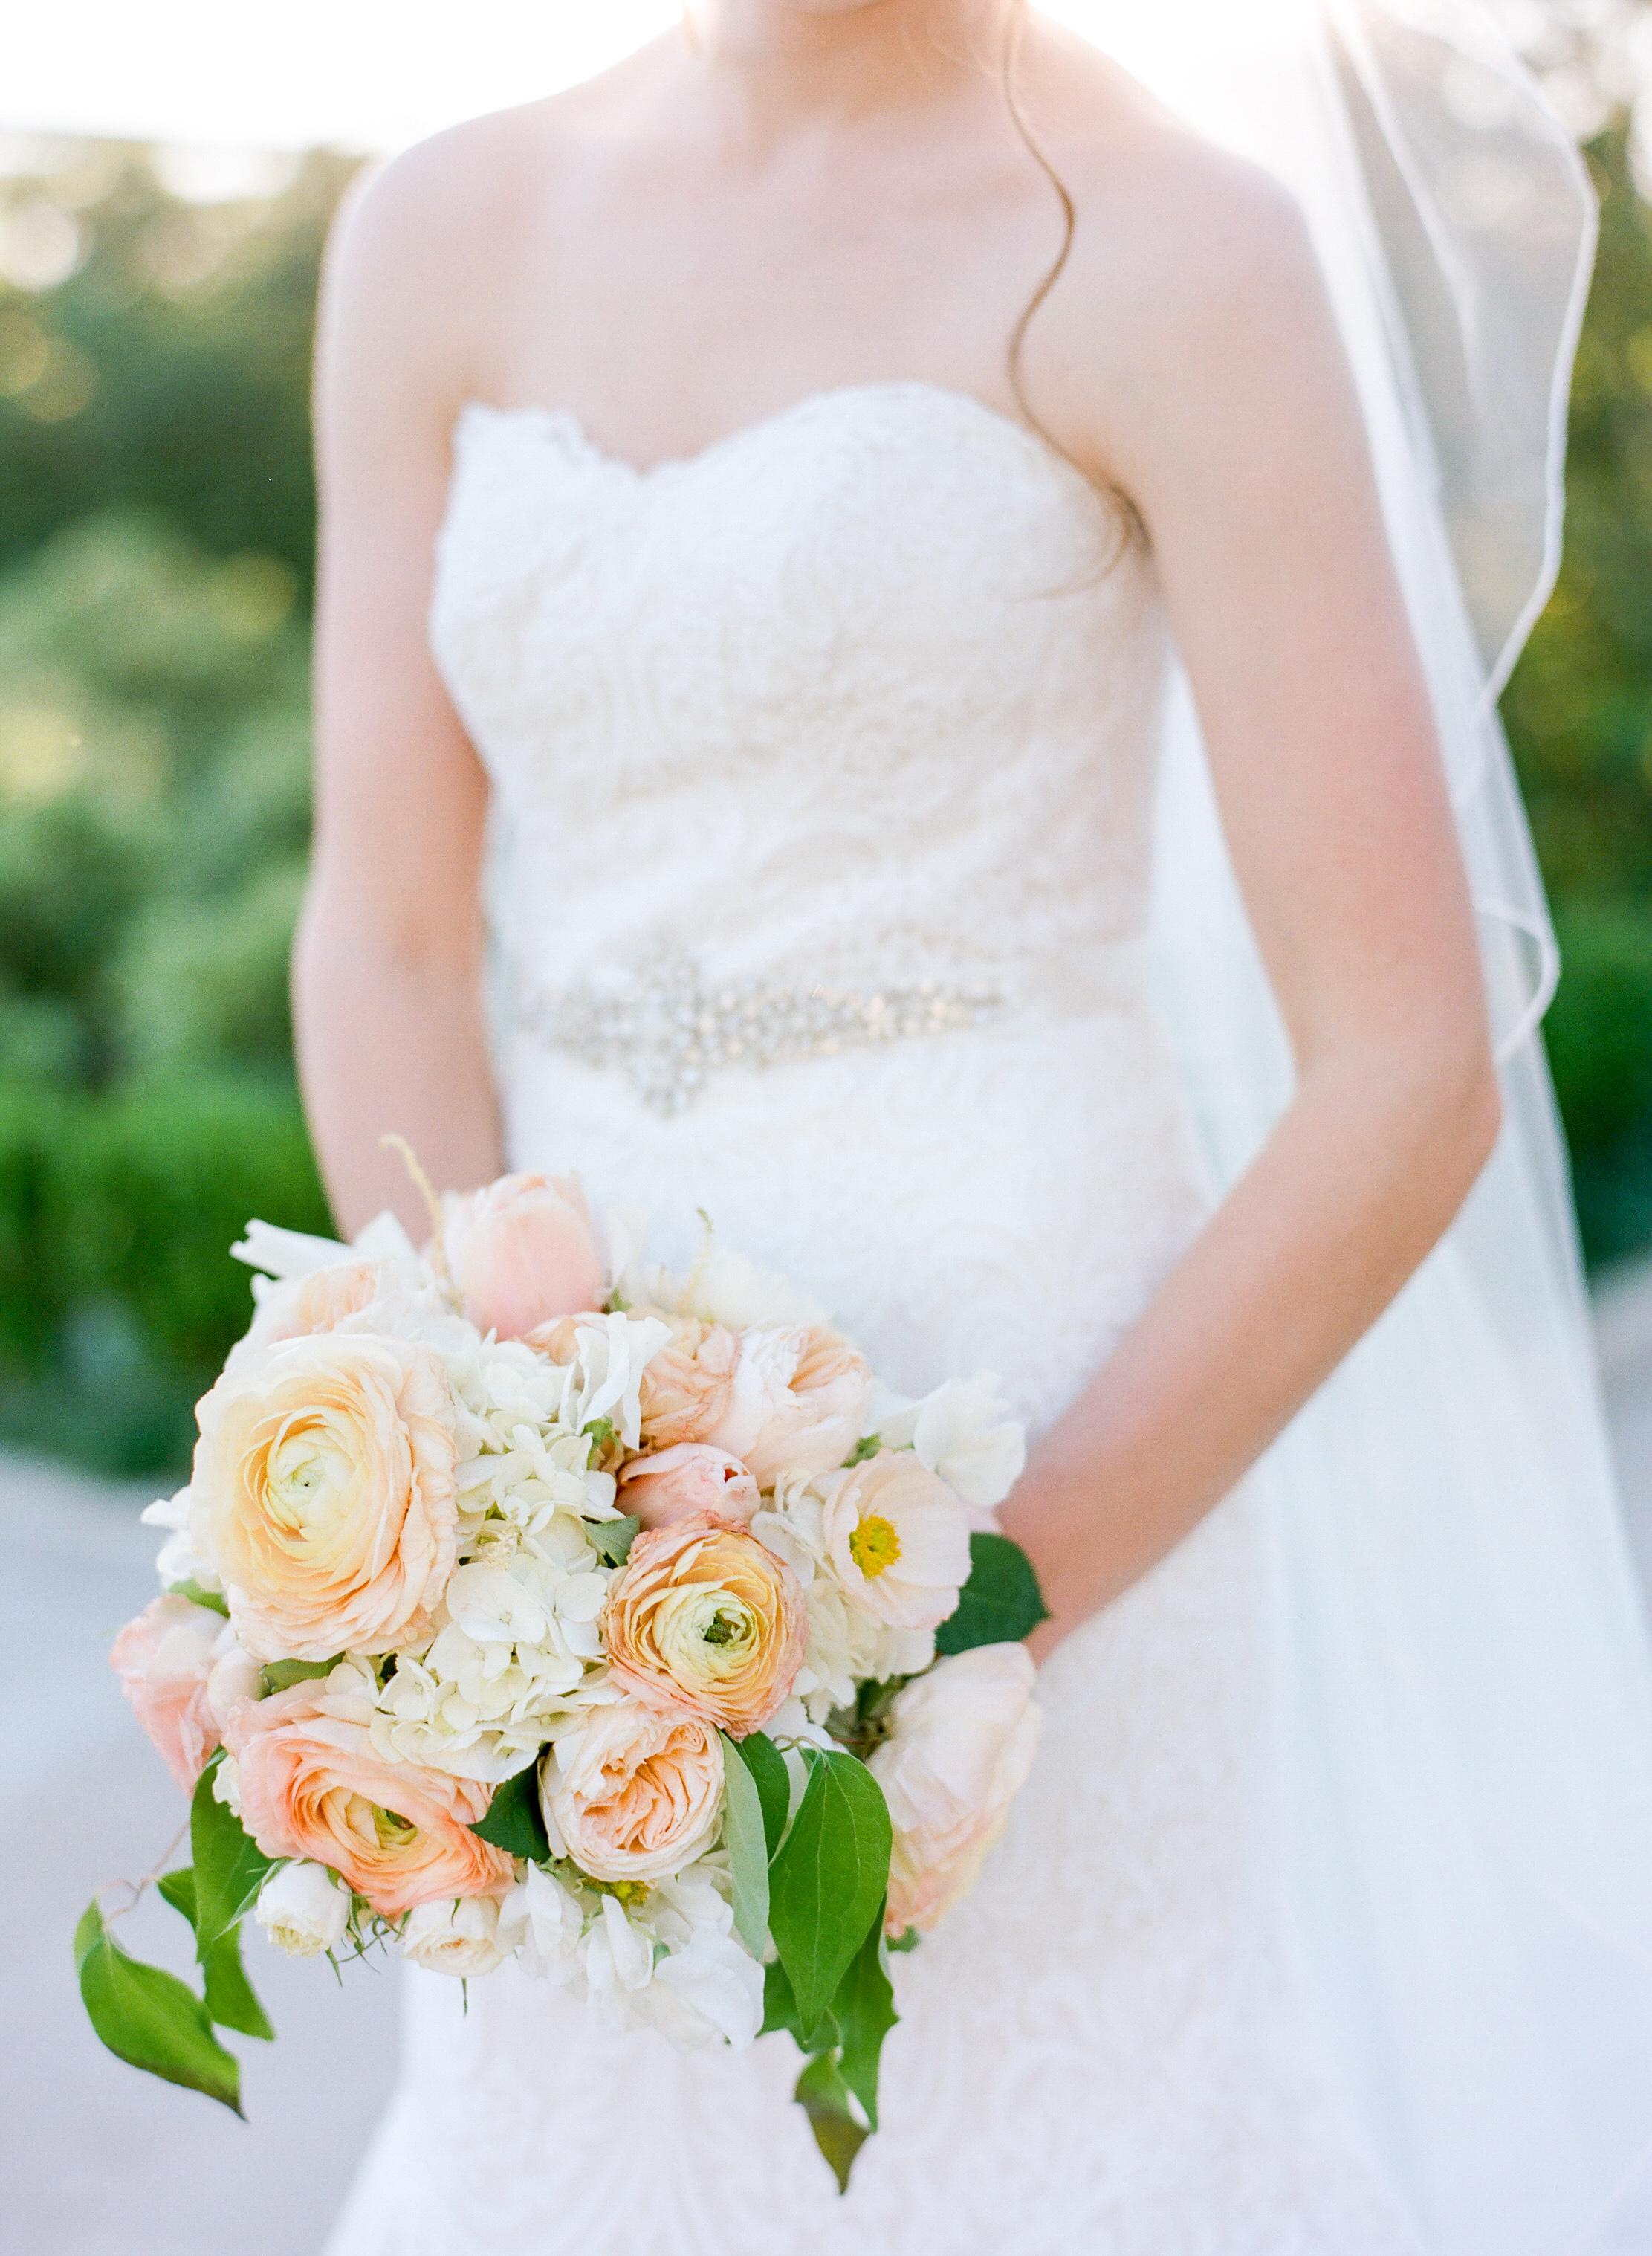 Houston-Wedding-Photographer-Film-Fine-Art-Bridals-Dana+Fernandez-Photography-7.jpg